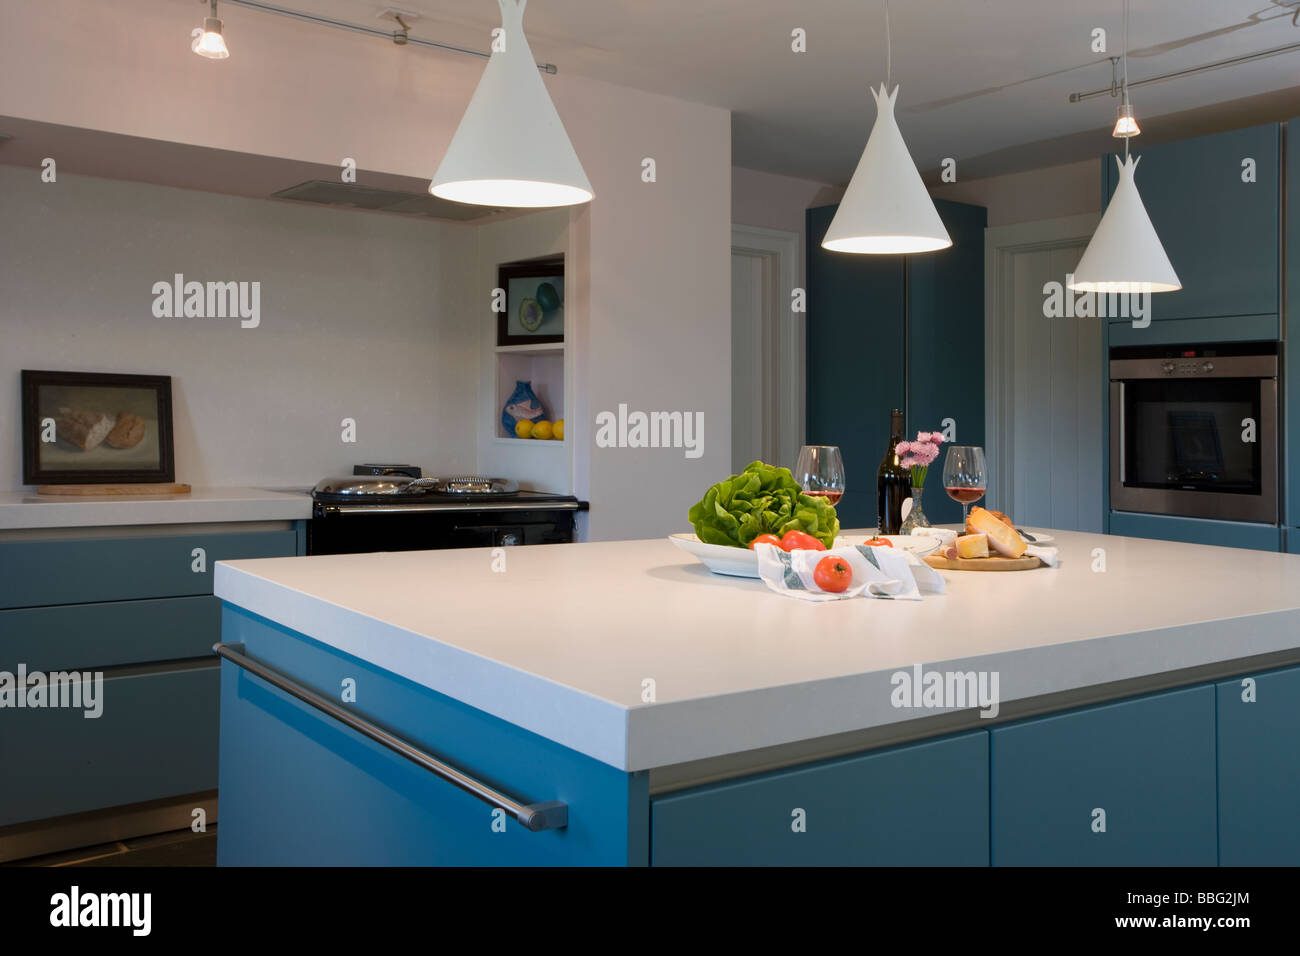 La cucina, moderna, nuova, pulita, utilitaristica,freschi,house Immagini Stock